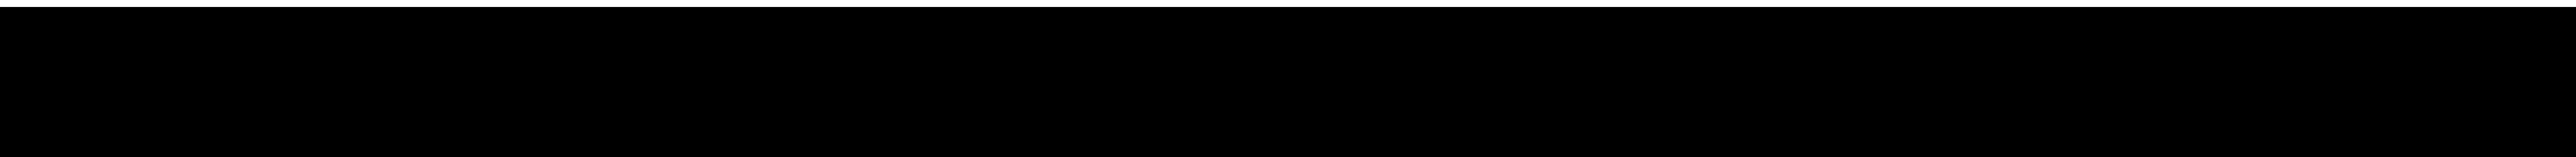 Bot-triangleB